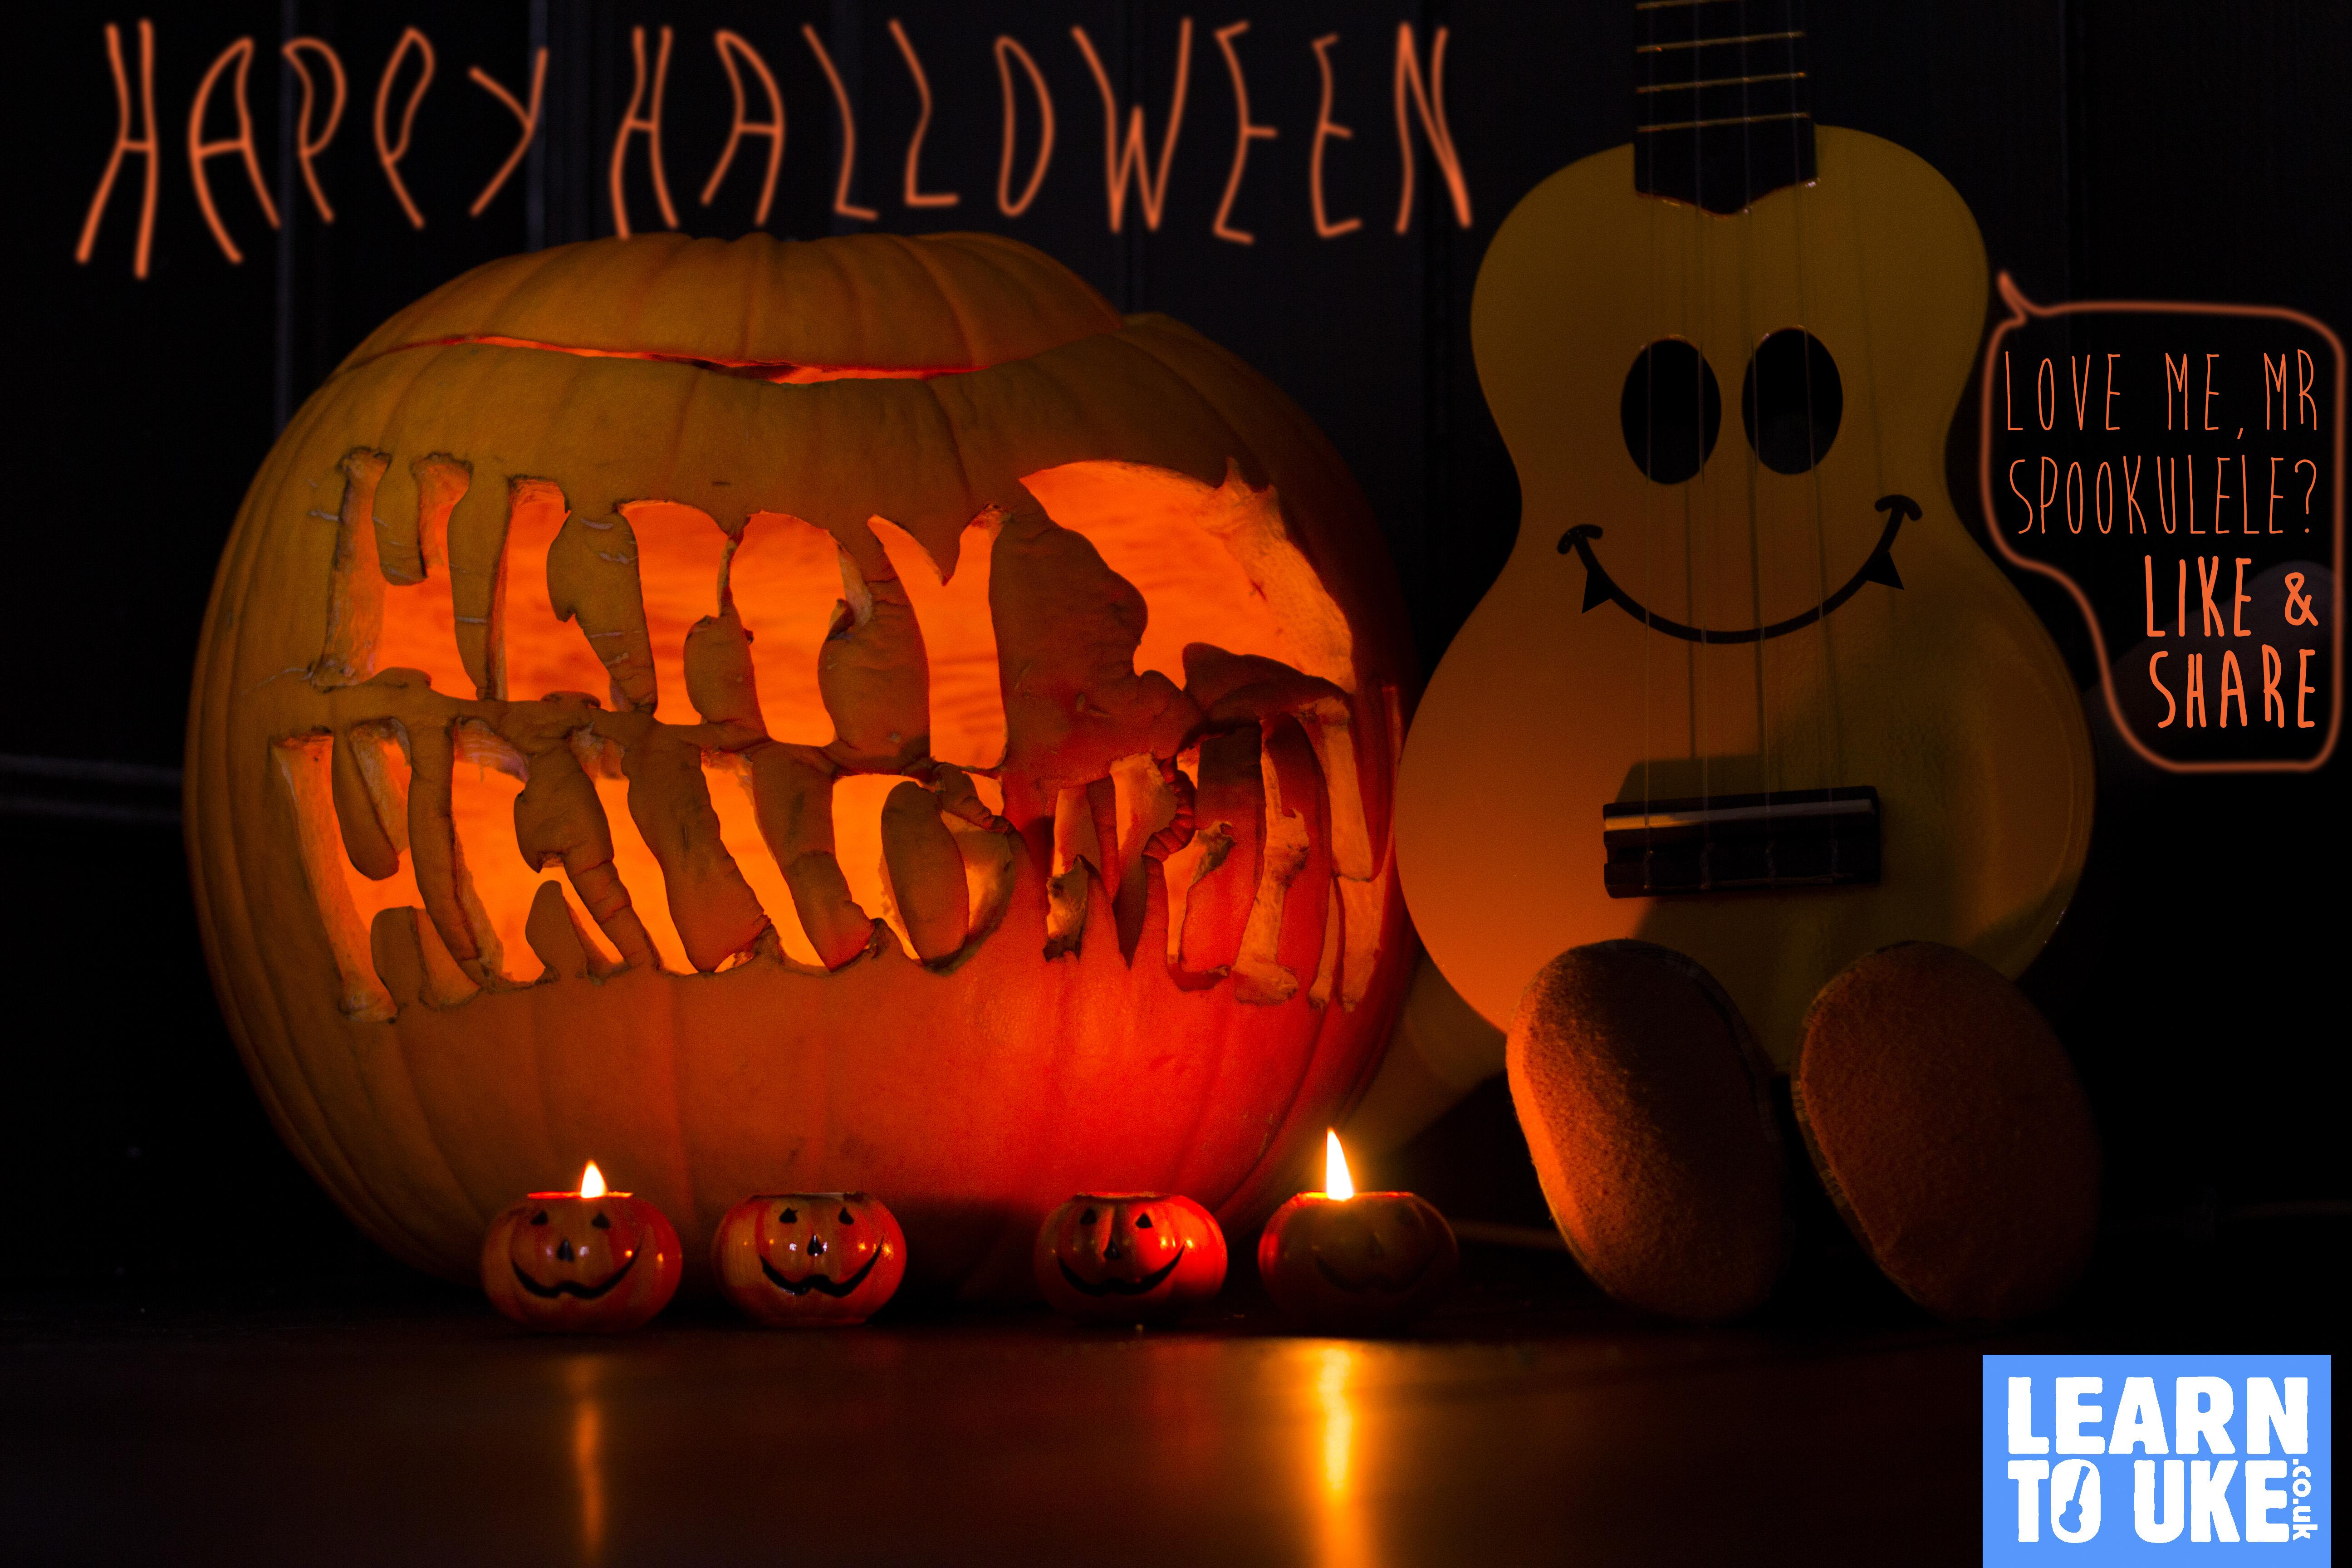 Happy Halloween From Mr Ukulele!